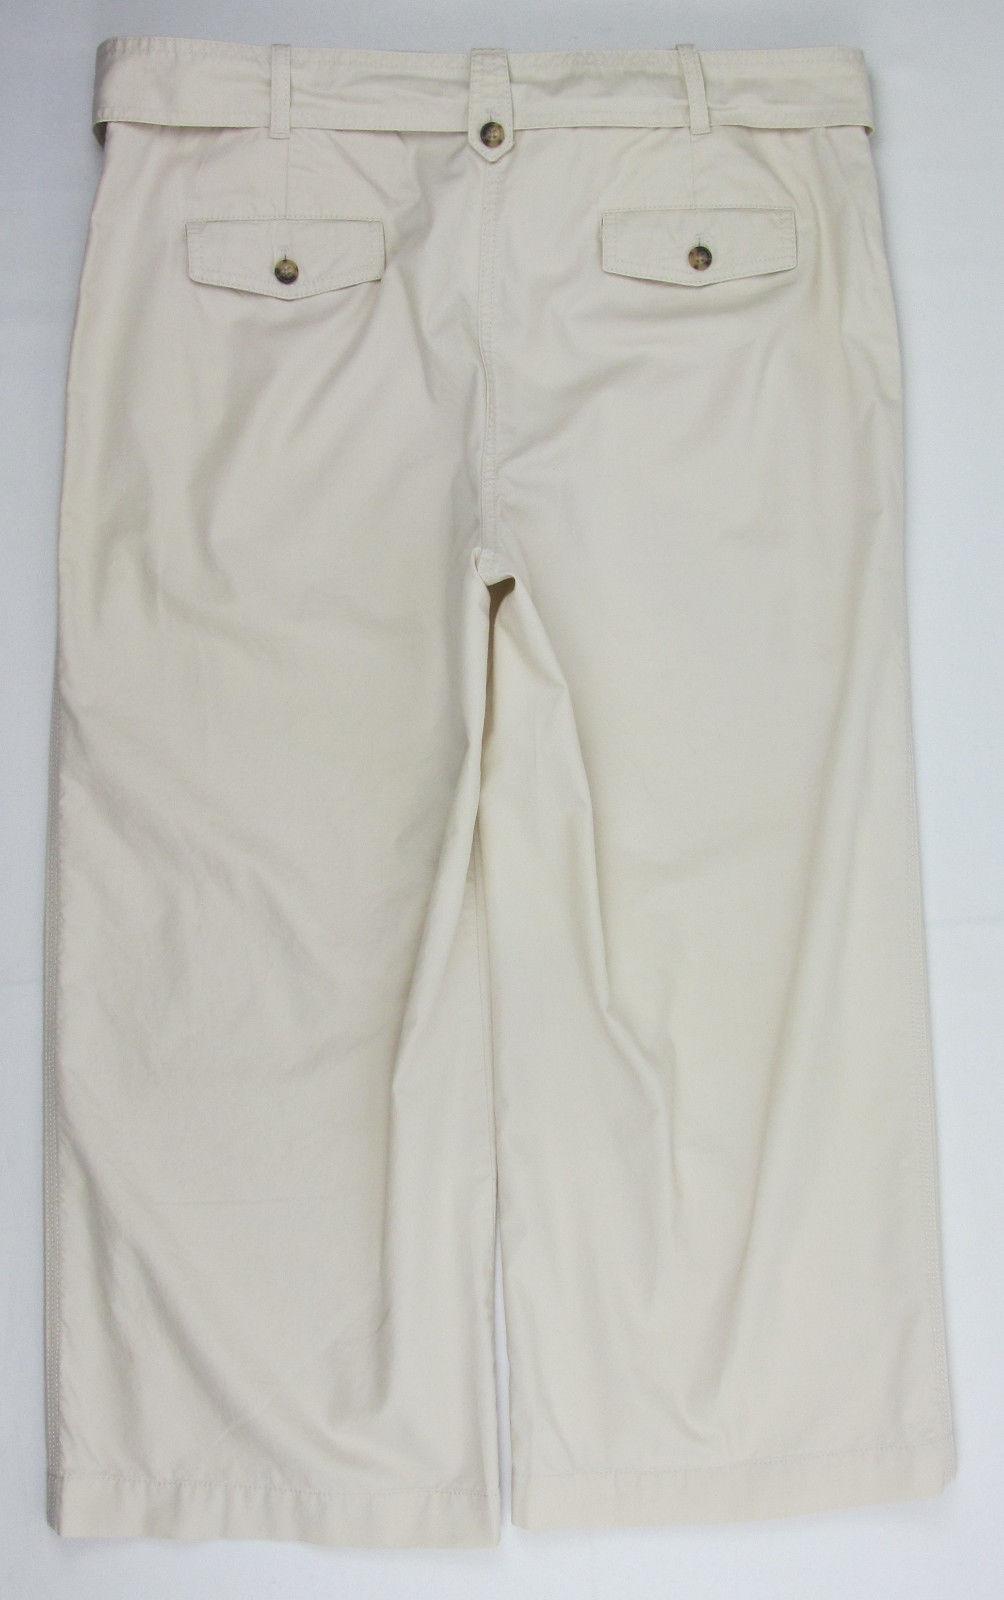 NWT Talbots Heritage Capri pants casual beige Womens Size 16 ~ $ 79